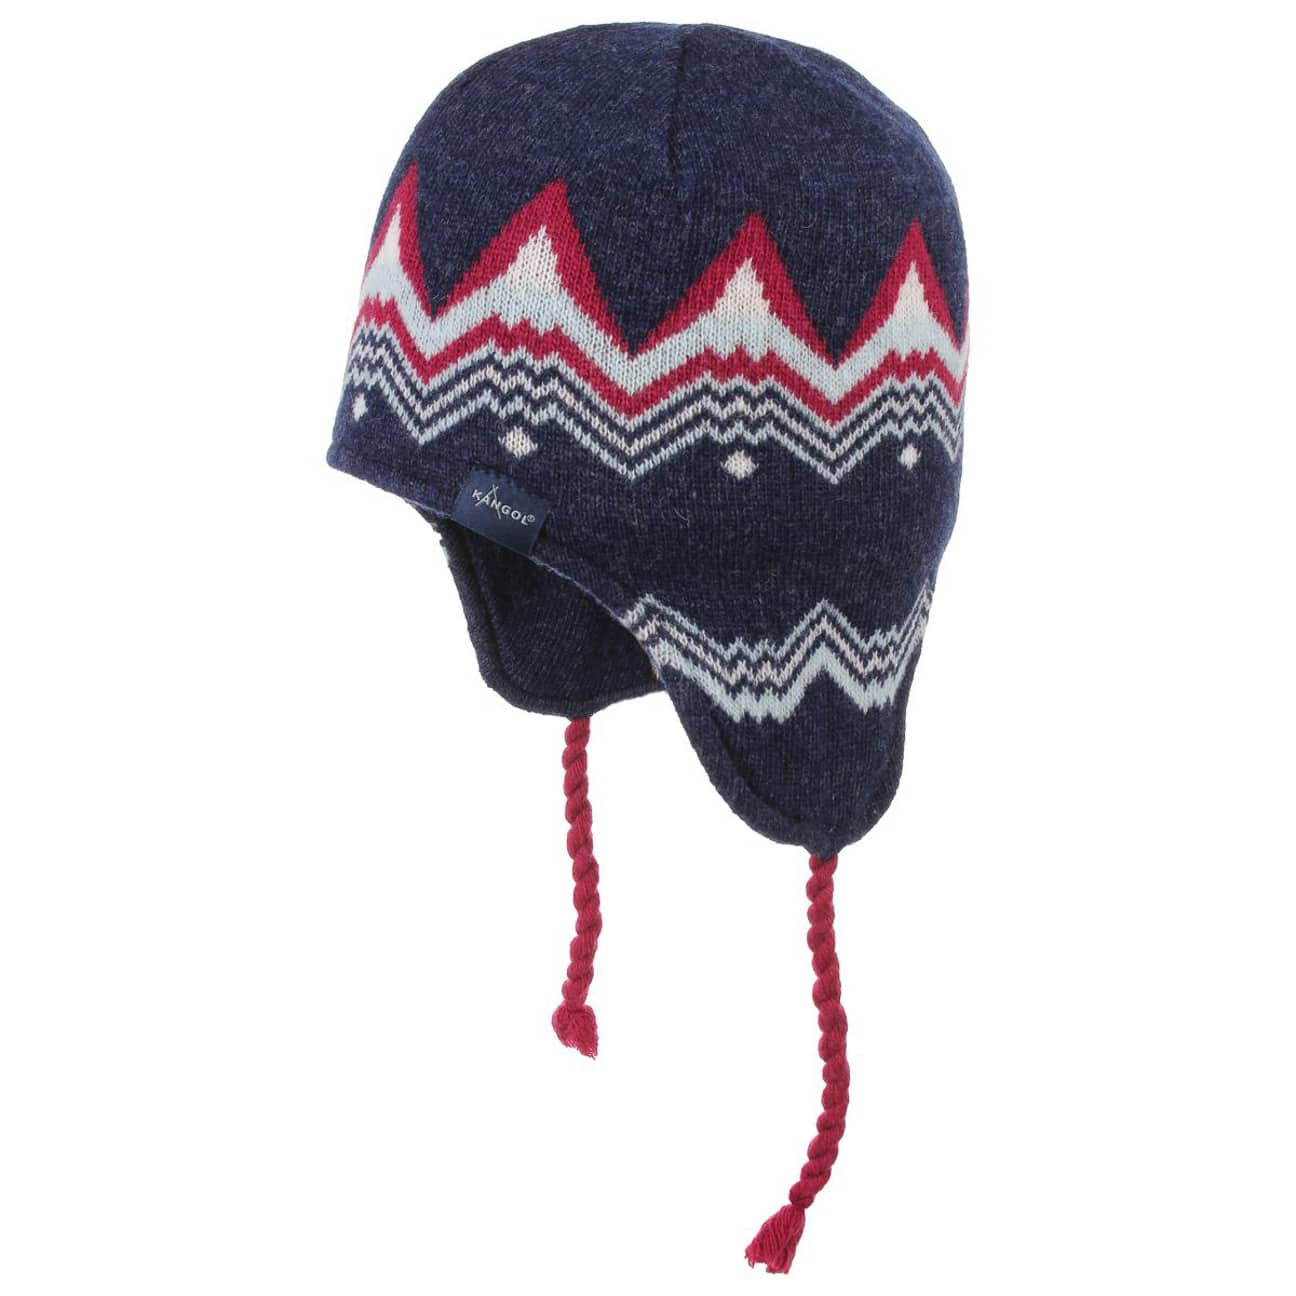 Gorro Peruano de Lana Nordic by Kangol - Gorros - sombreroshop.es cc9594e31ce